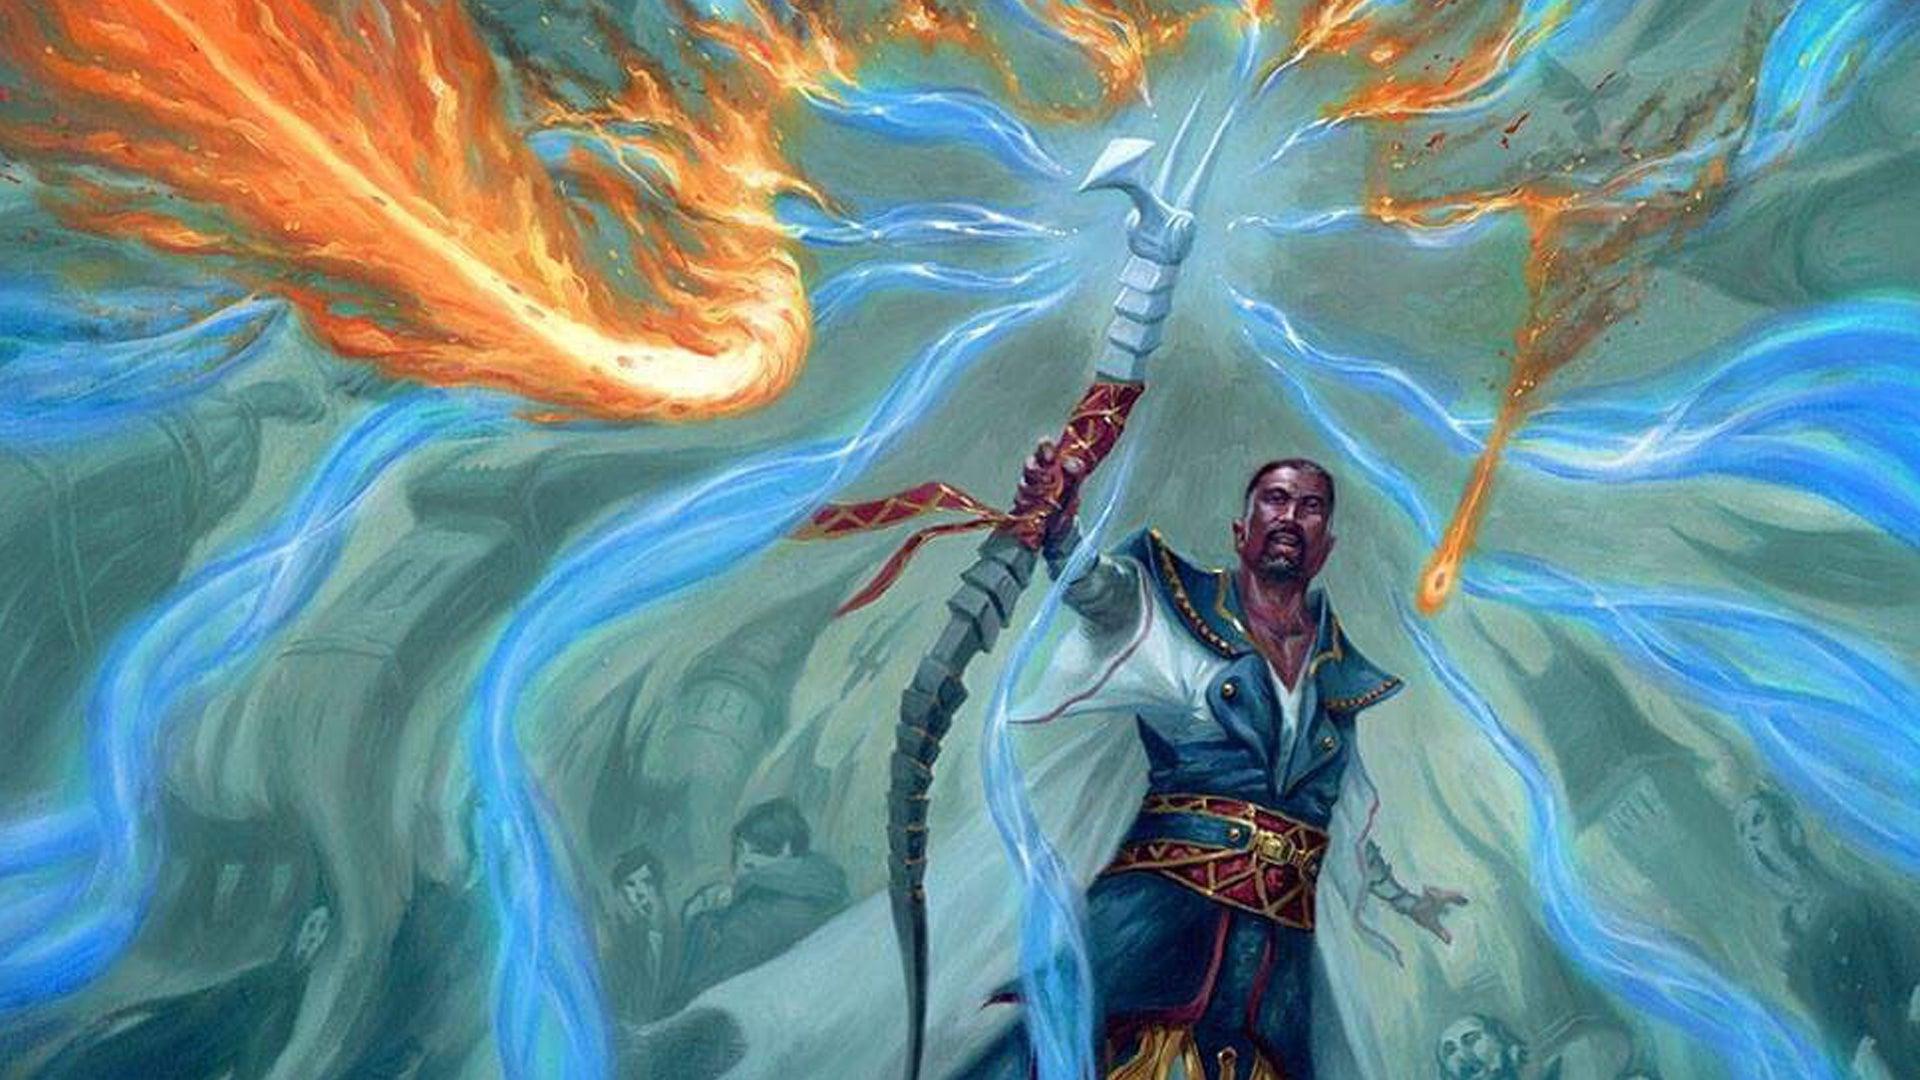 Teferi, Magic: The Gathering, trading card game